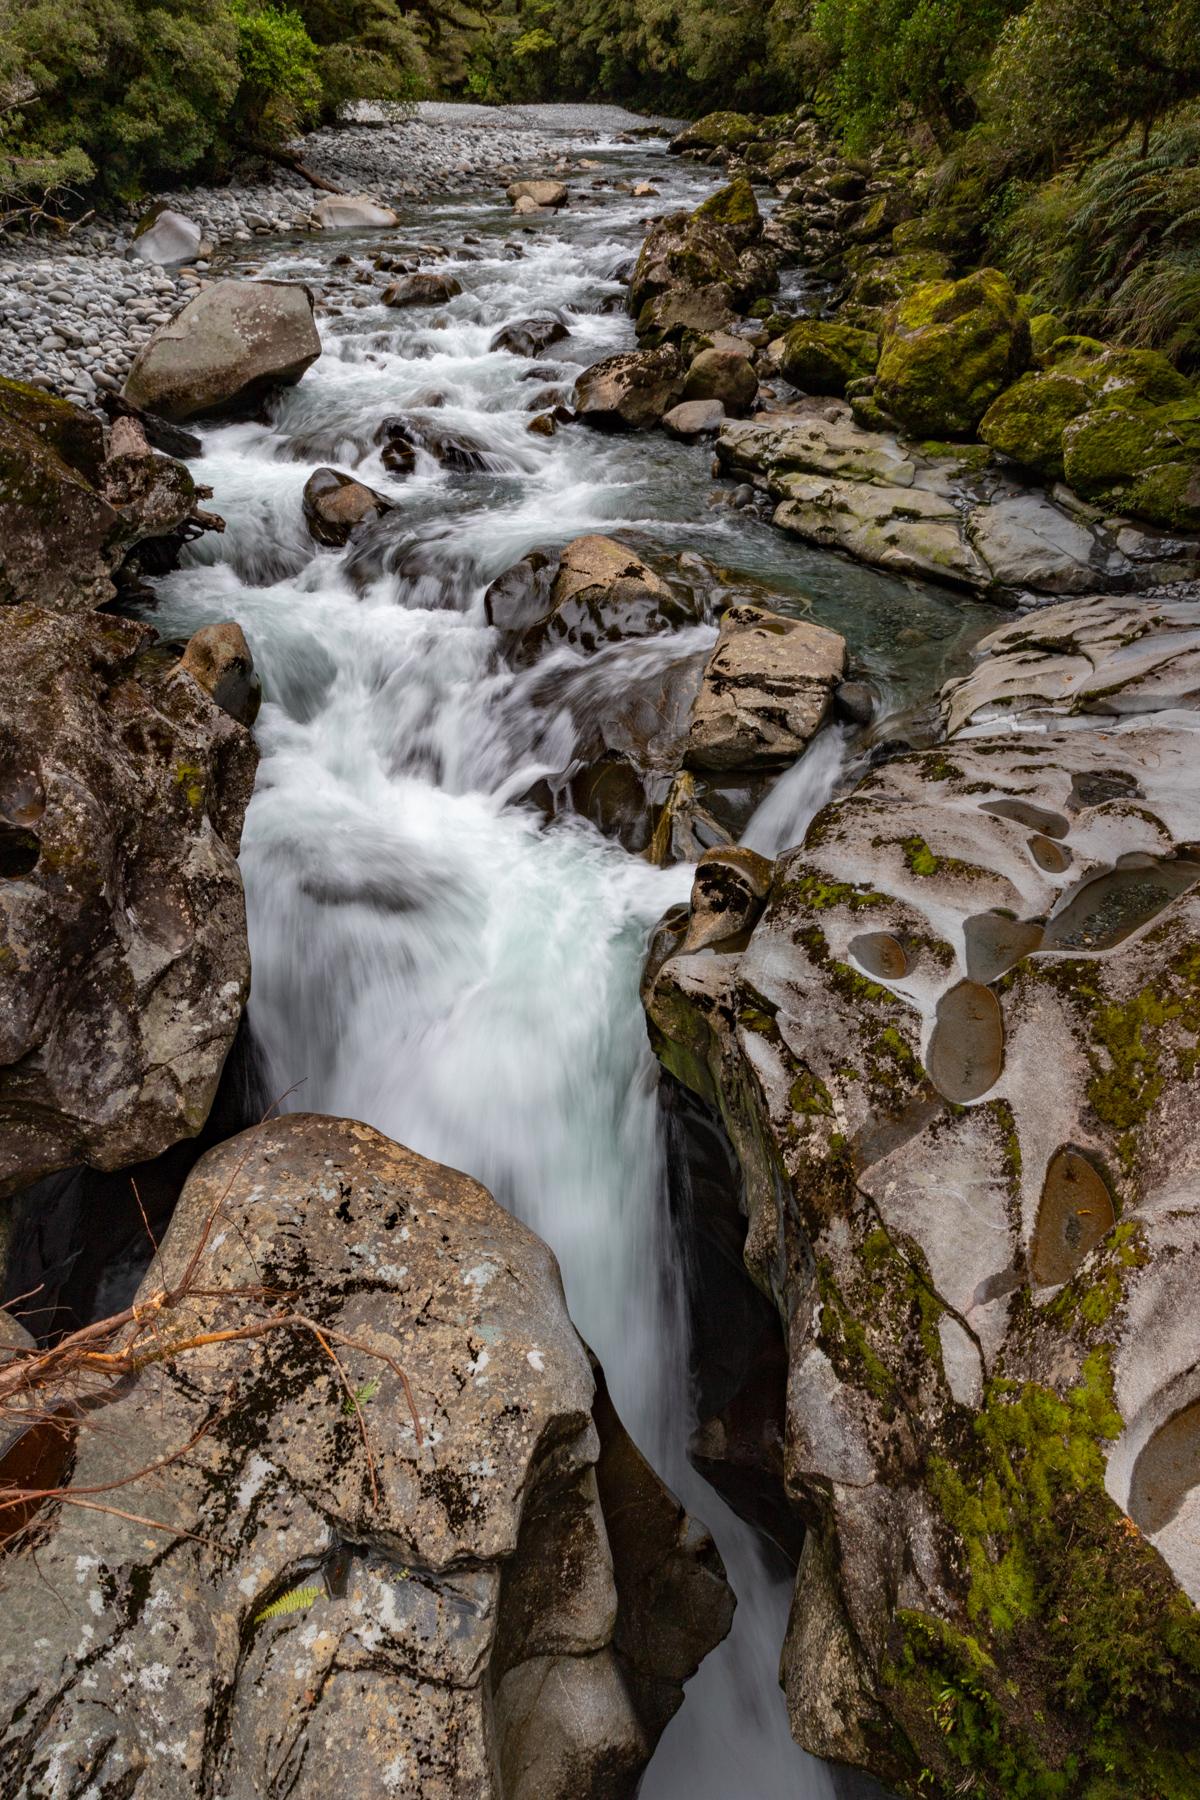 img 9818 lr The Chasm (Milford Sound)